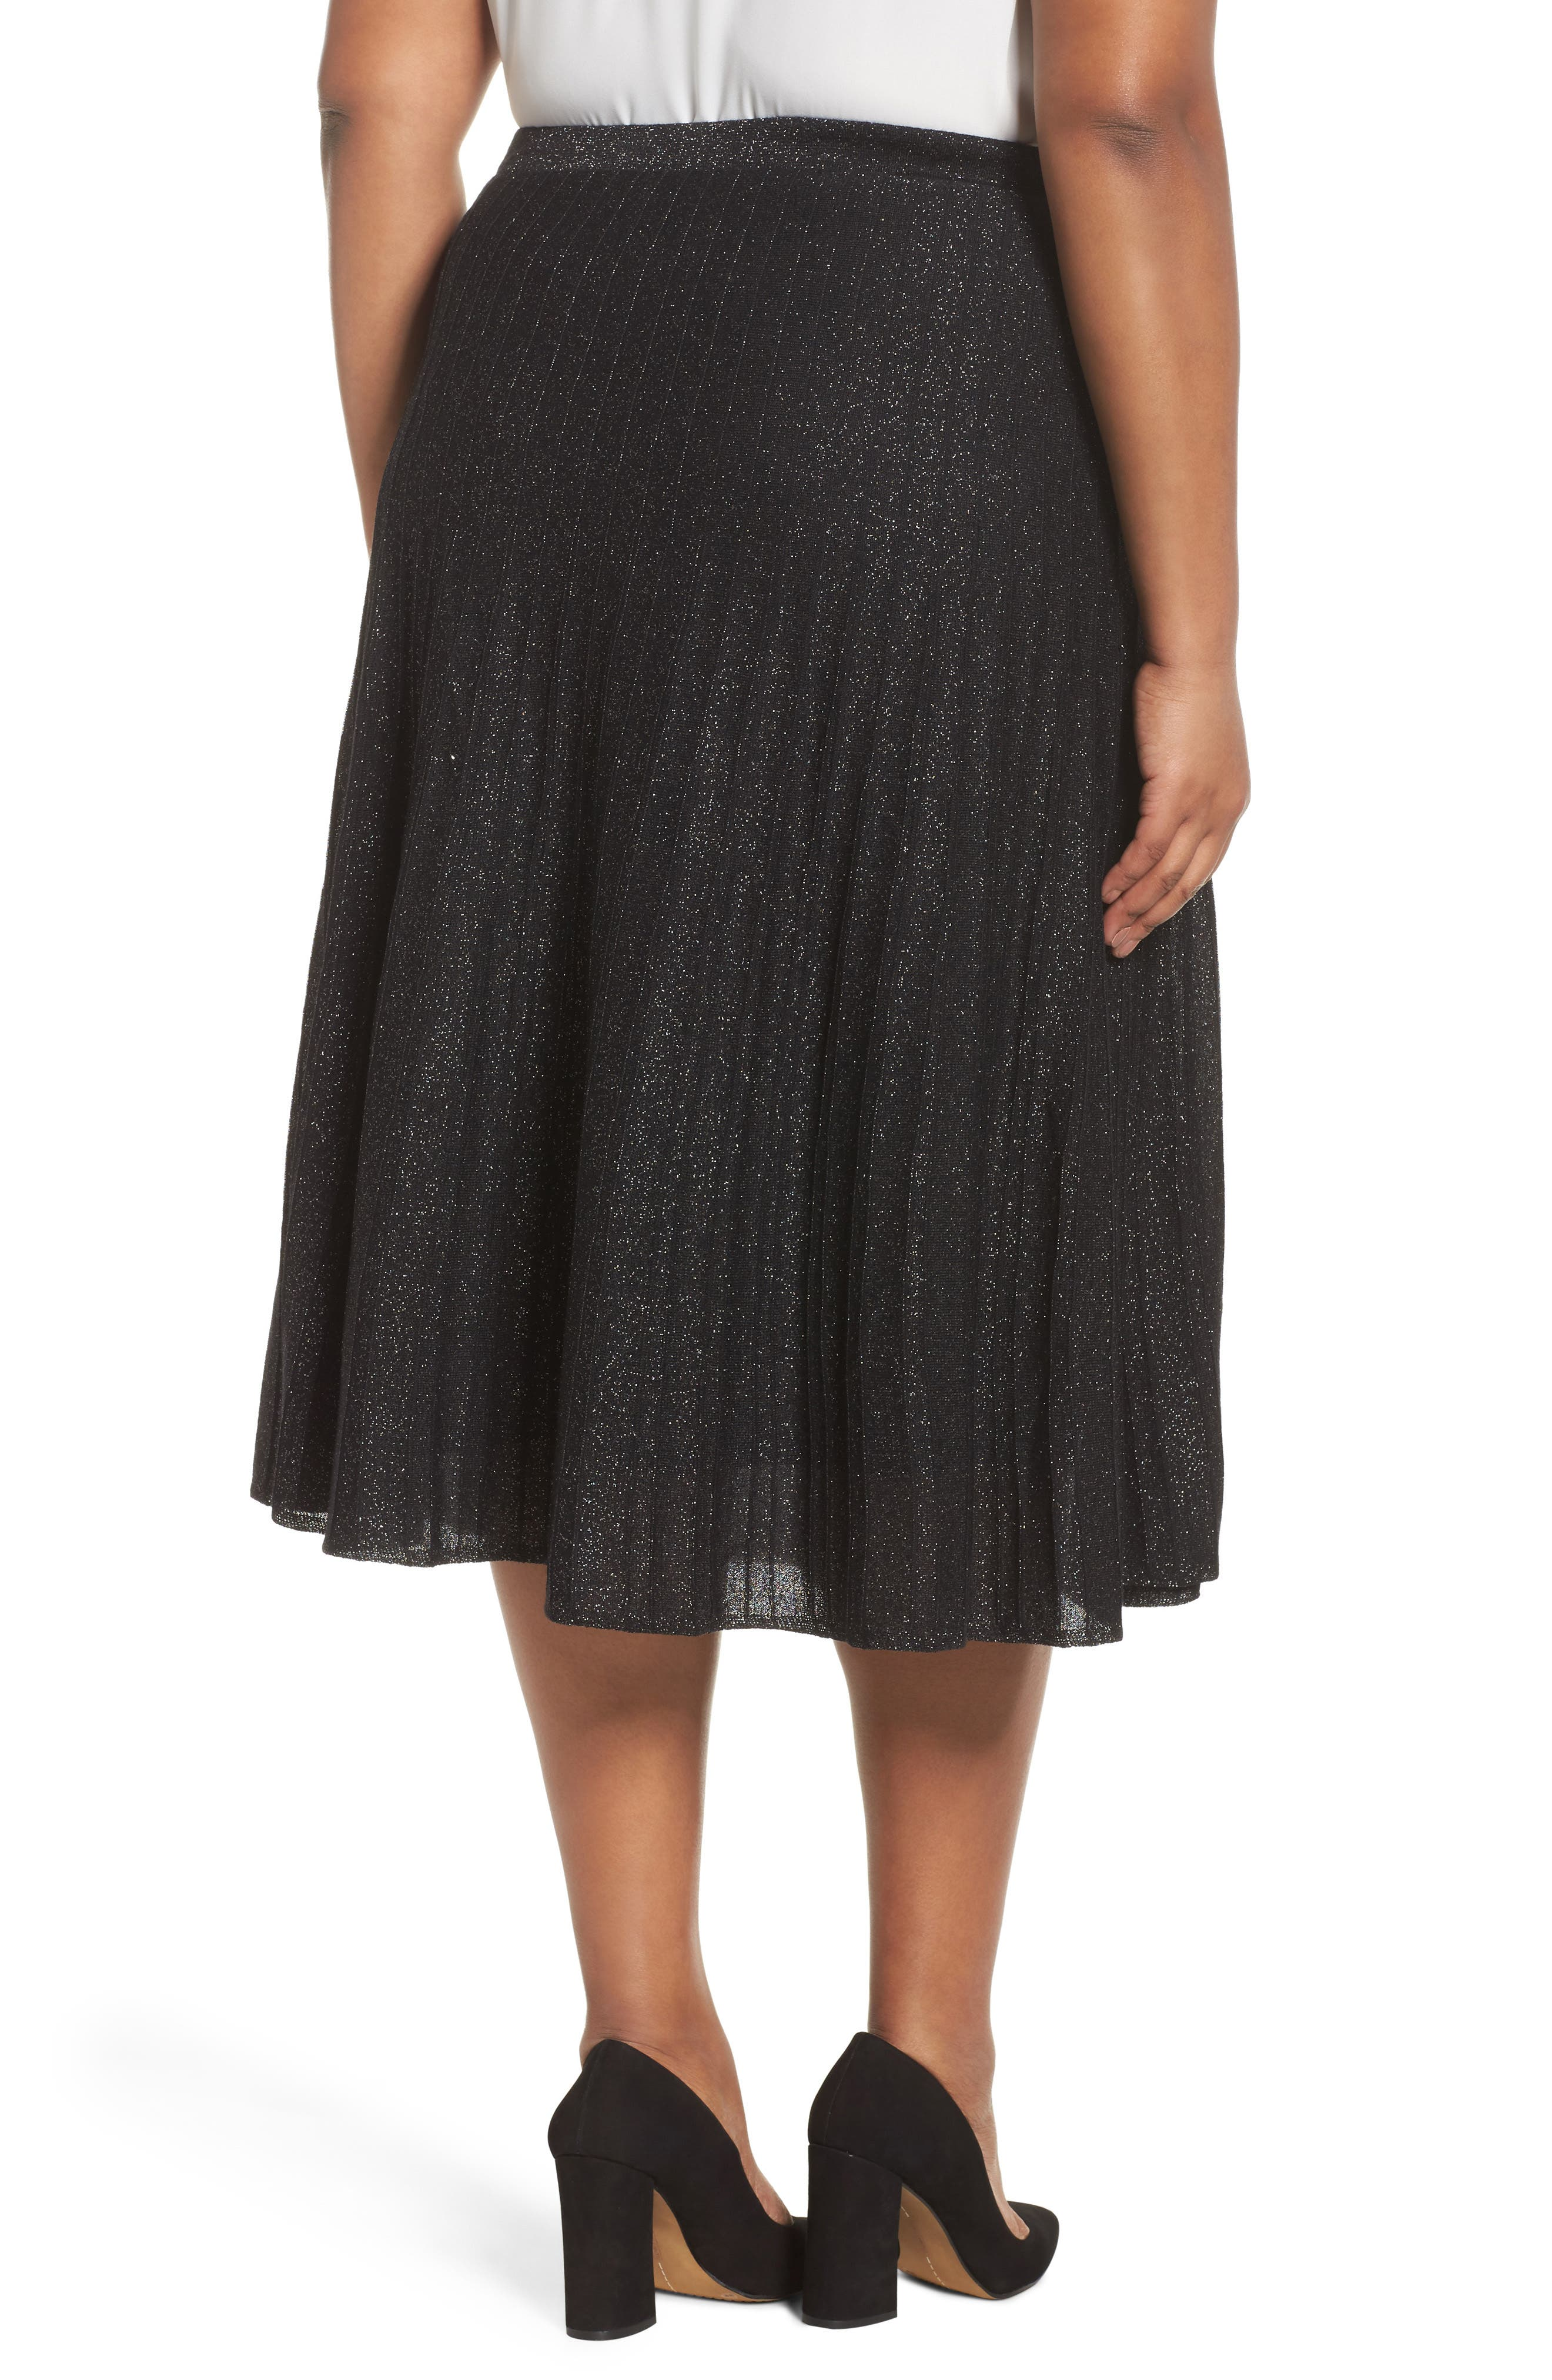 Luminary Skirt,                             Alternate thumbnail 2, color,                             Black Mix